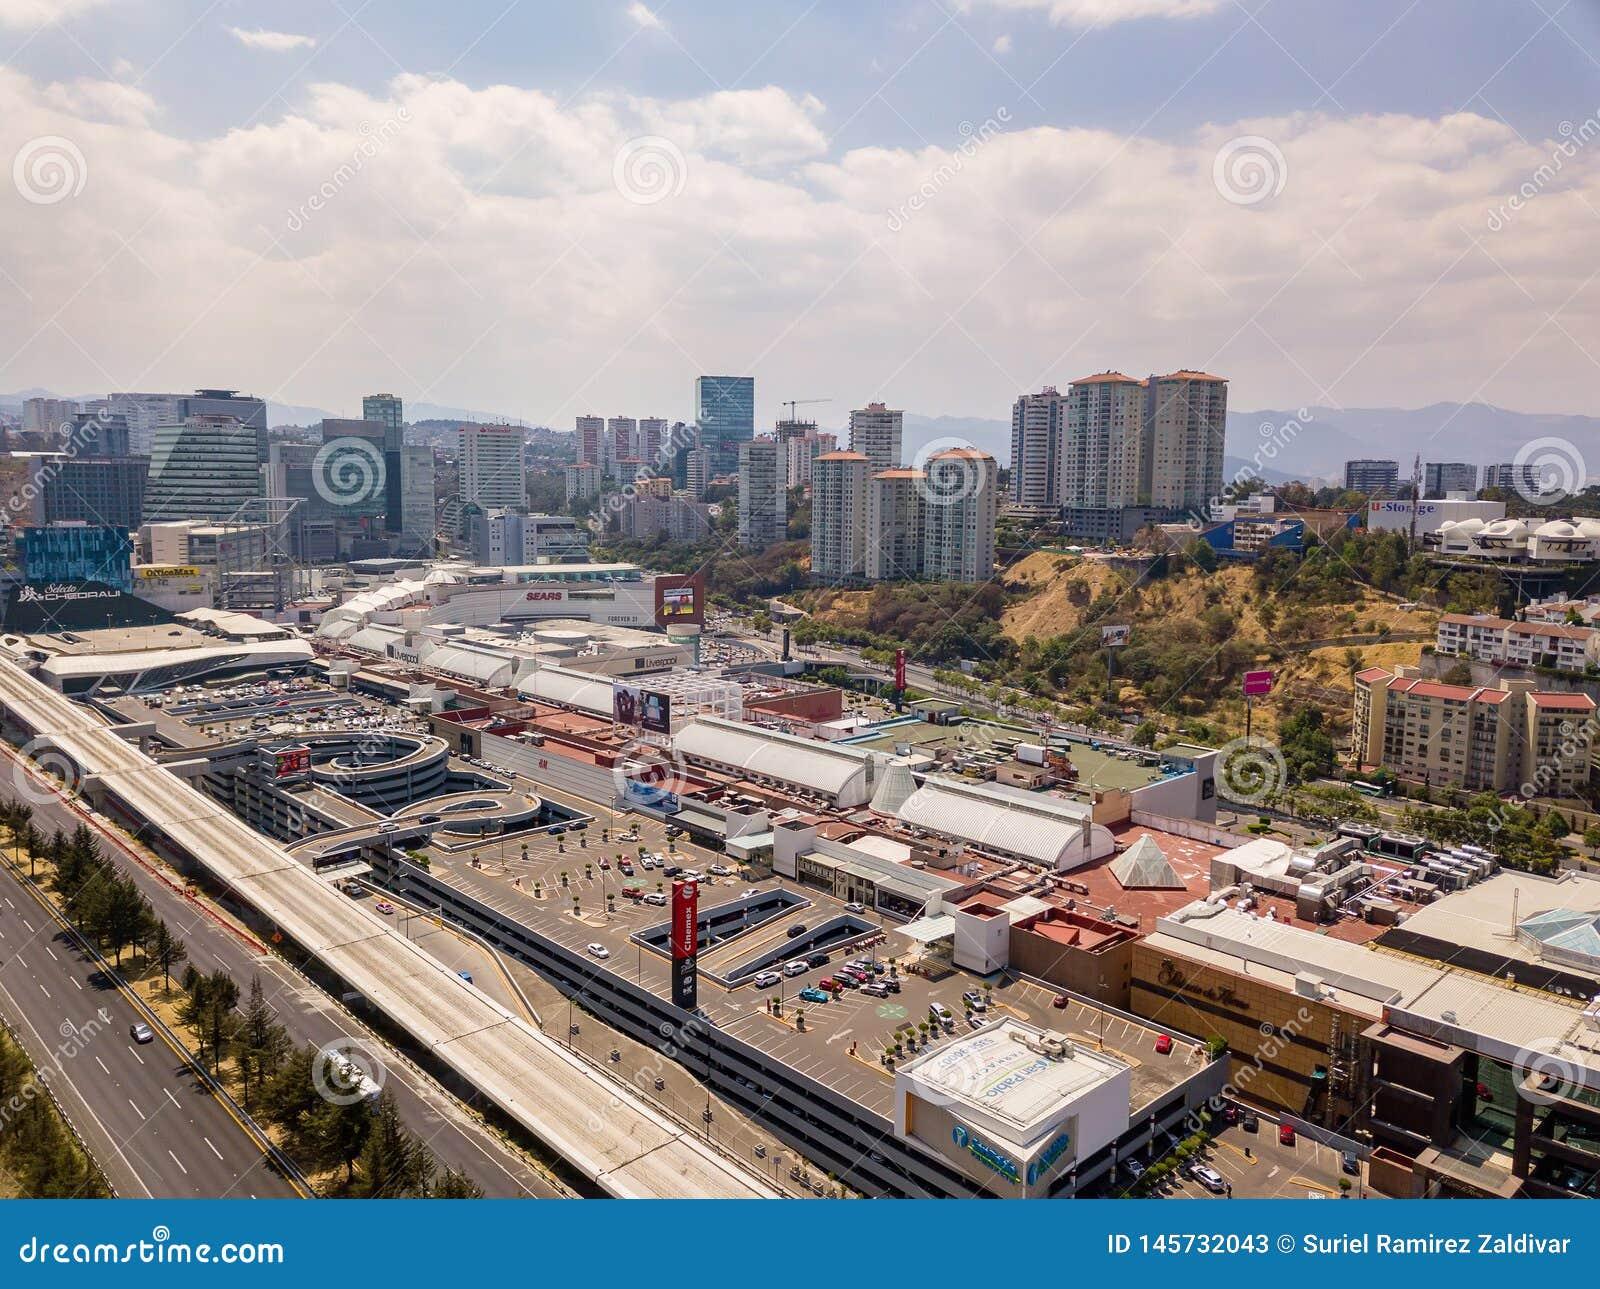 Mexico City Santa Fe Panoramic View Editorial Stock Photo Image Of Buildings Urban 145732043